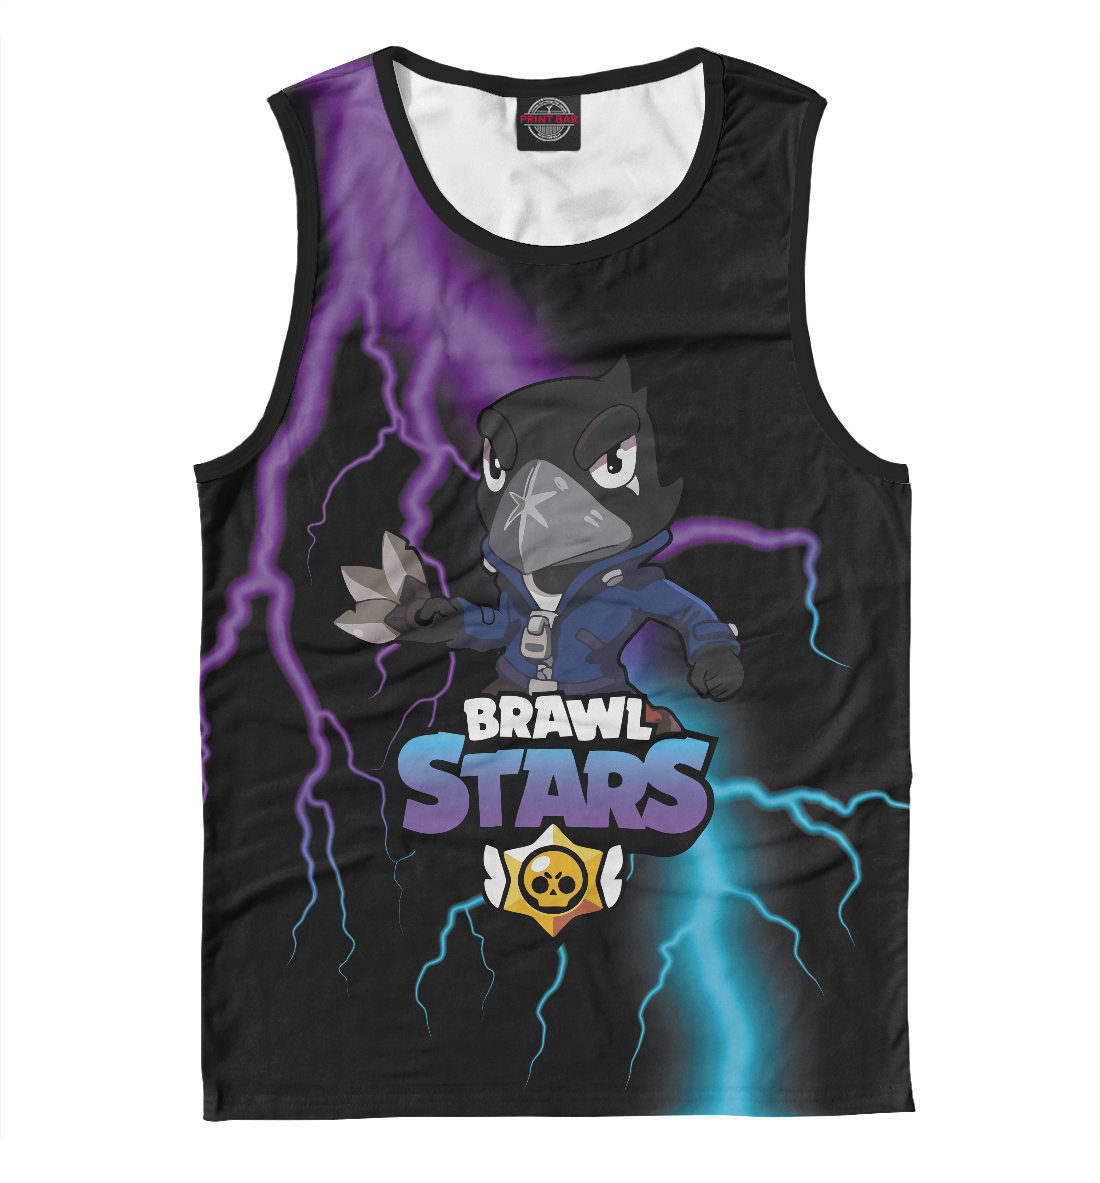 Brawl Stars Crow детская футболка 3d brawl stars crow 128